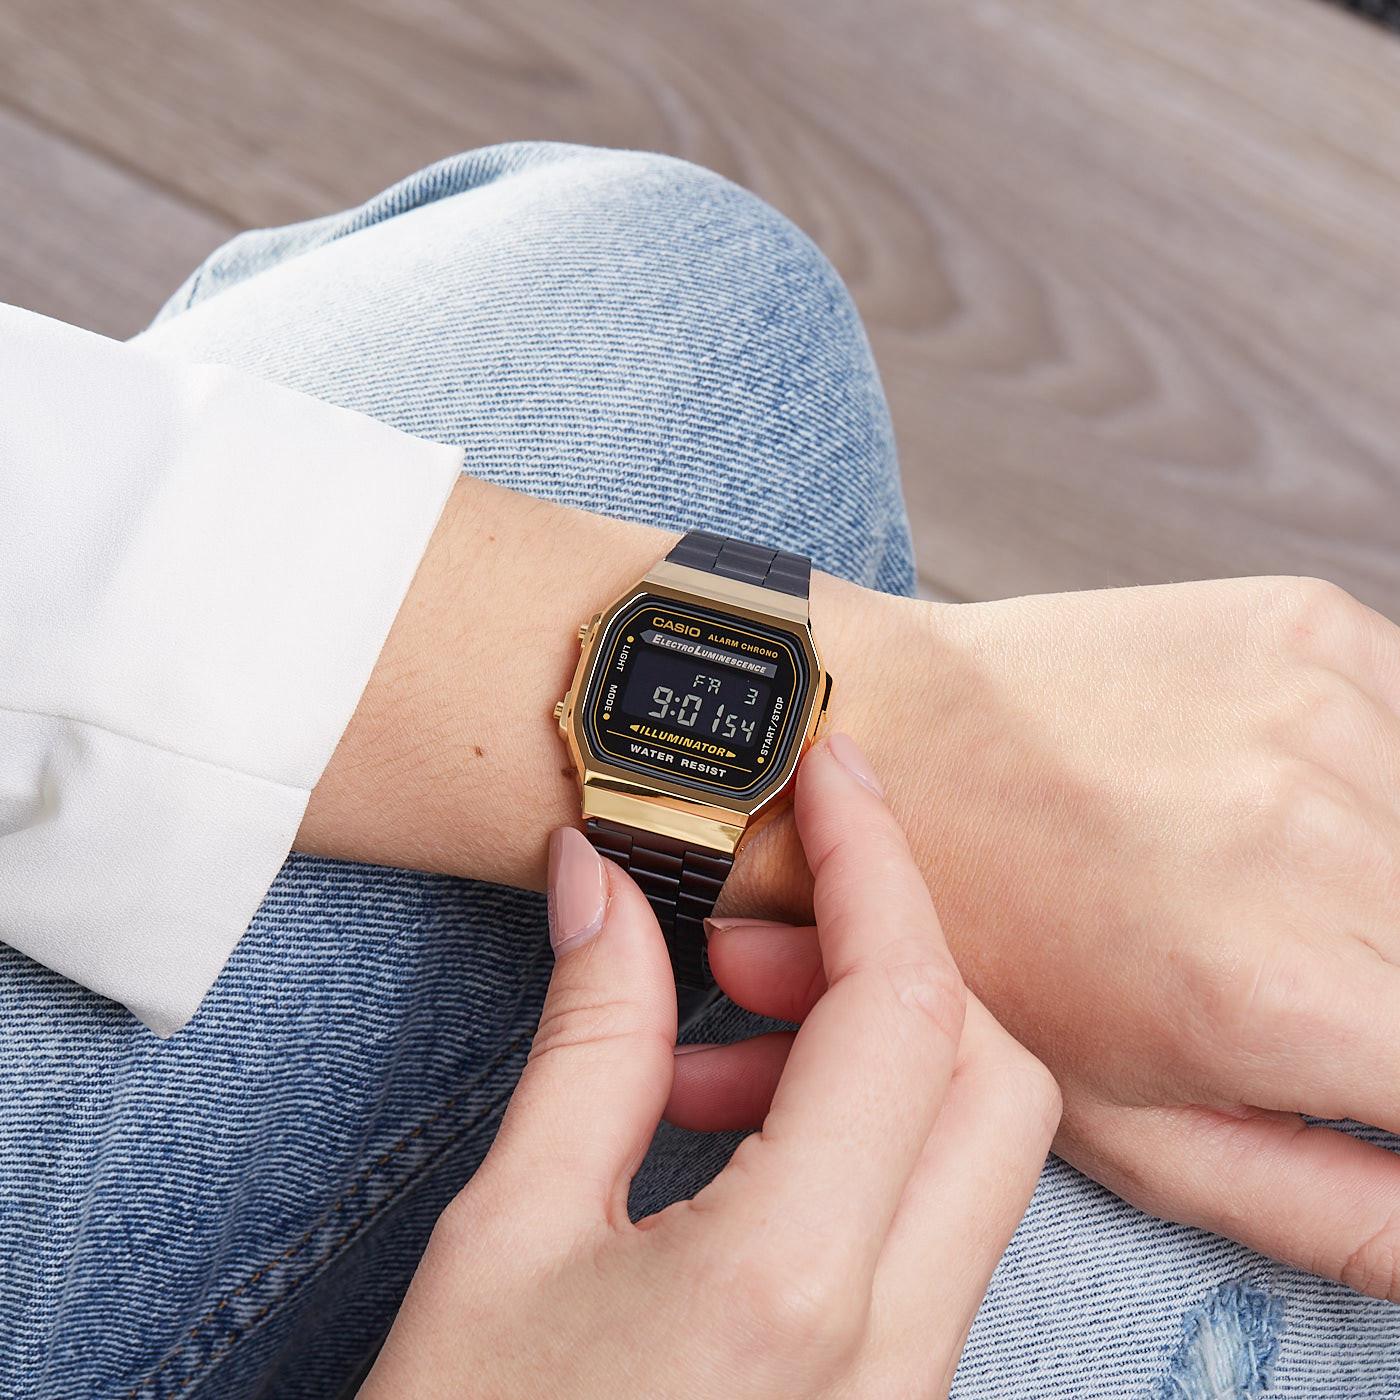 33c11f12b0e1 Casio Retro watch A168WEGB-1BEF - Watches